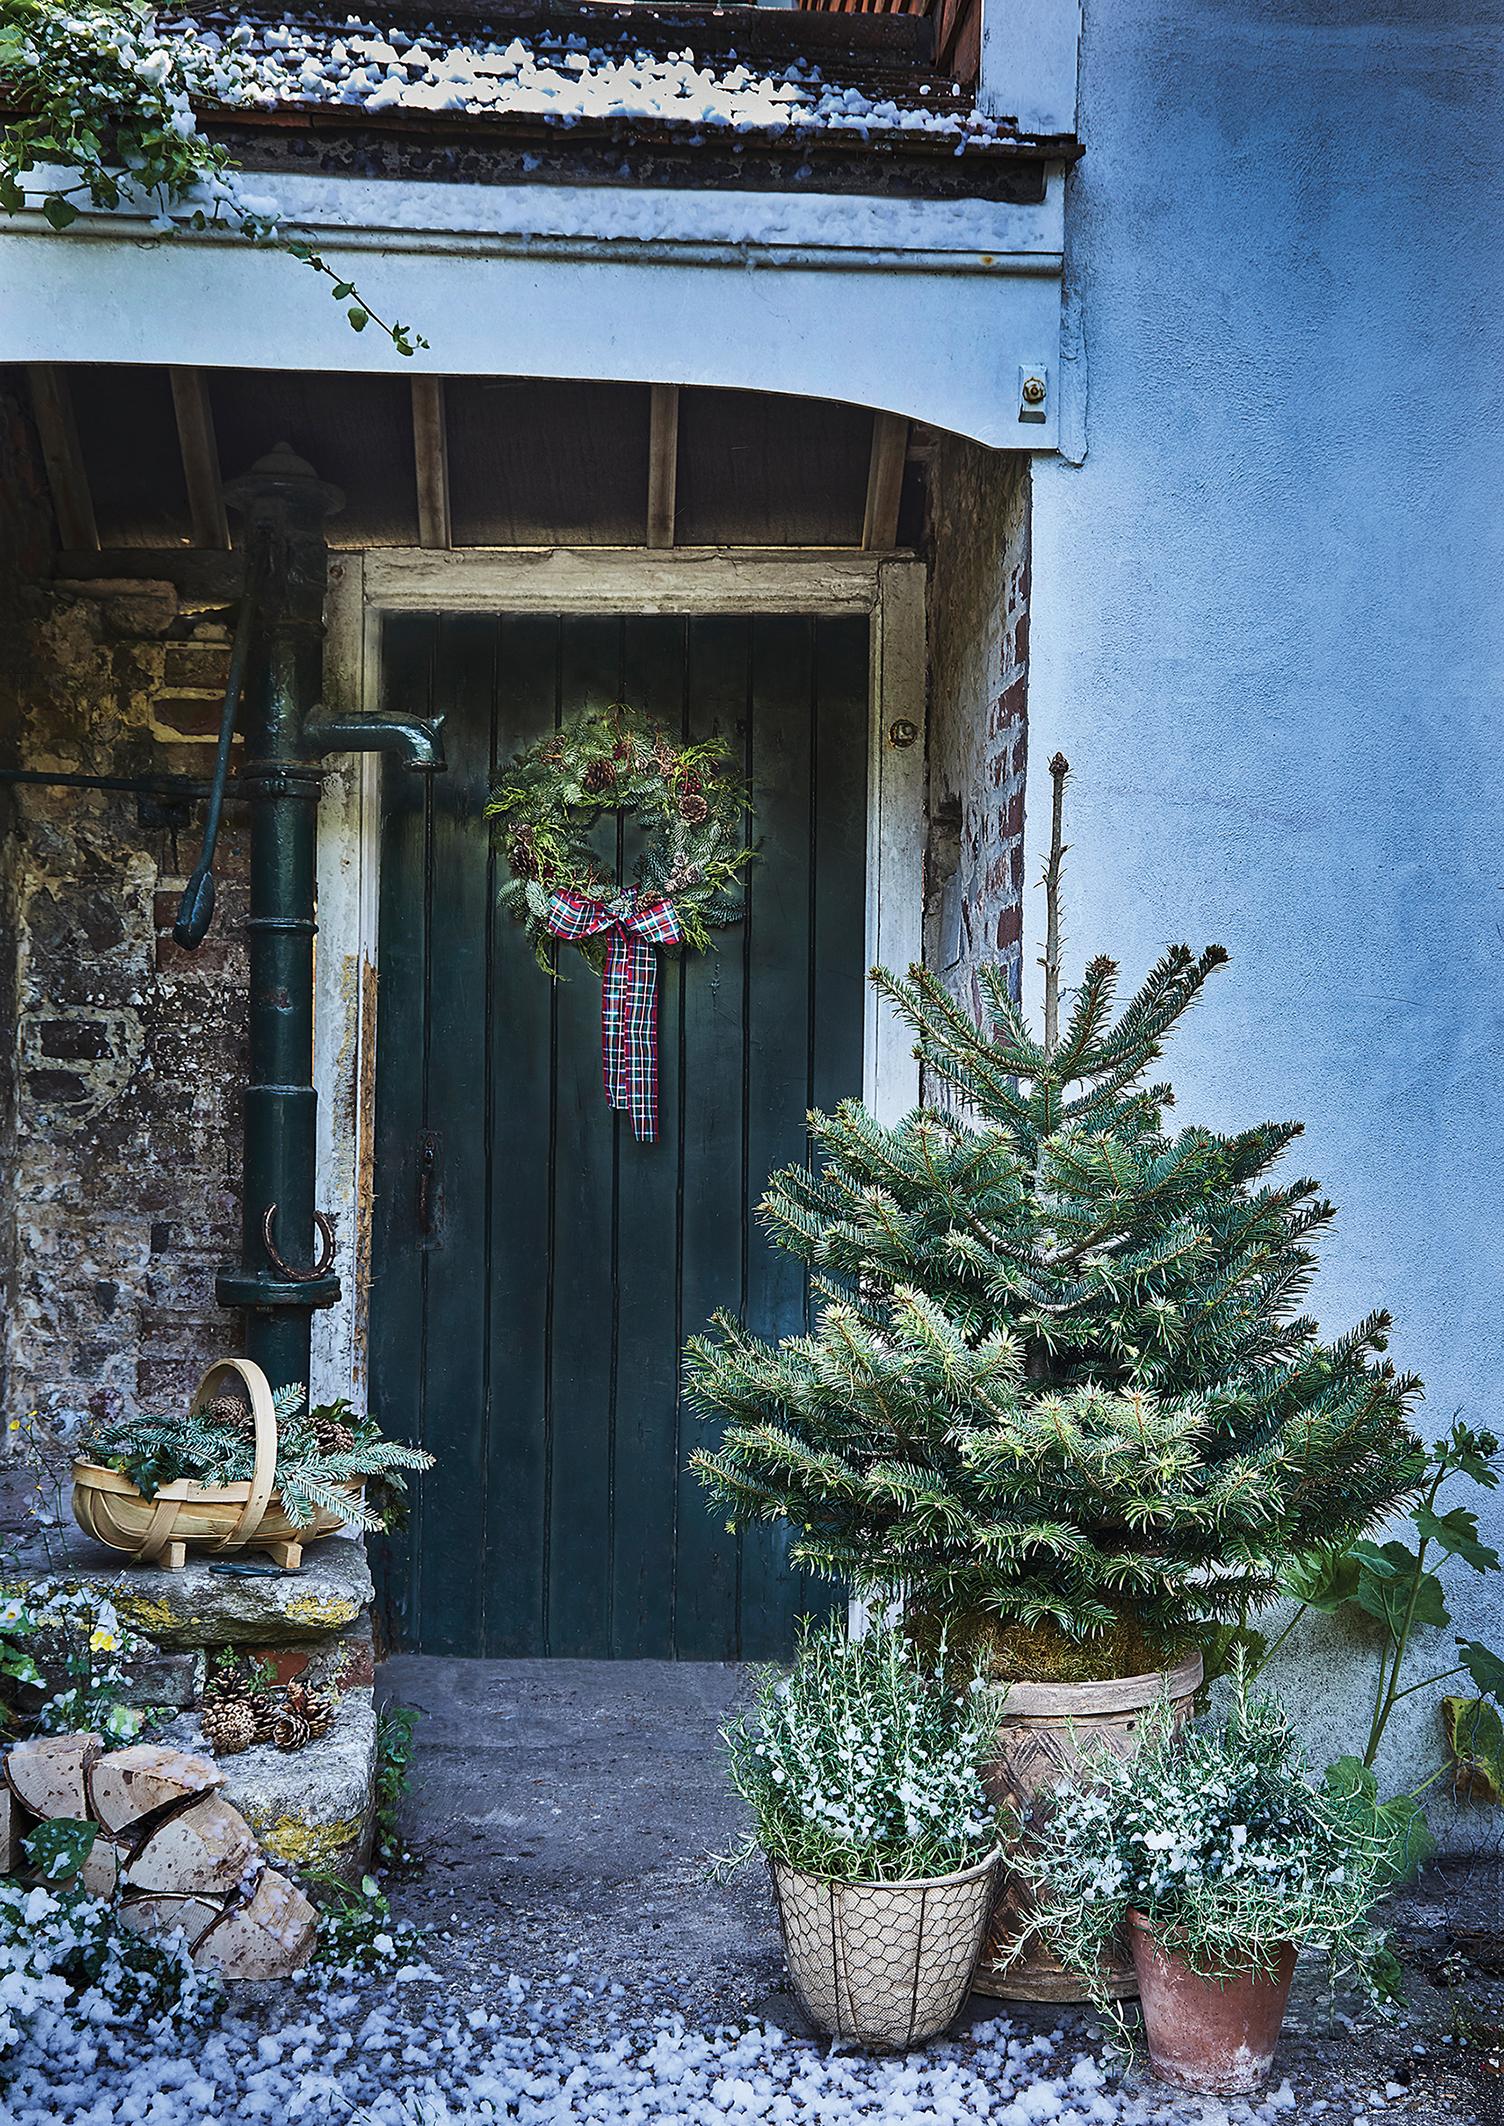 How To Pimp Your Porch At Christmas Bt